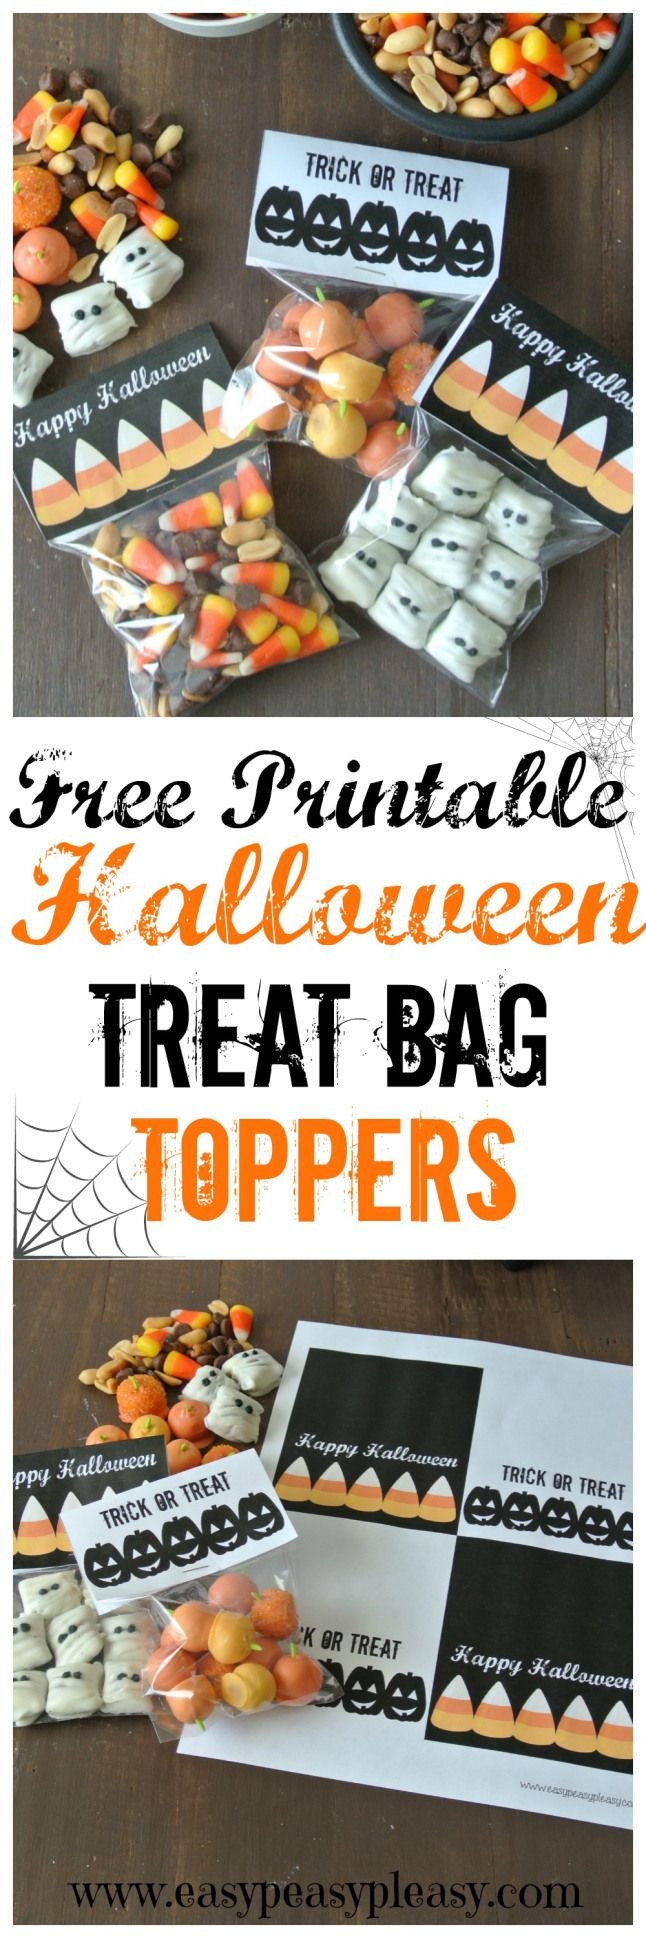 Free Printable Halloween Treat Bag Toppers | Easy Peasy Pleasy